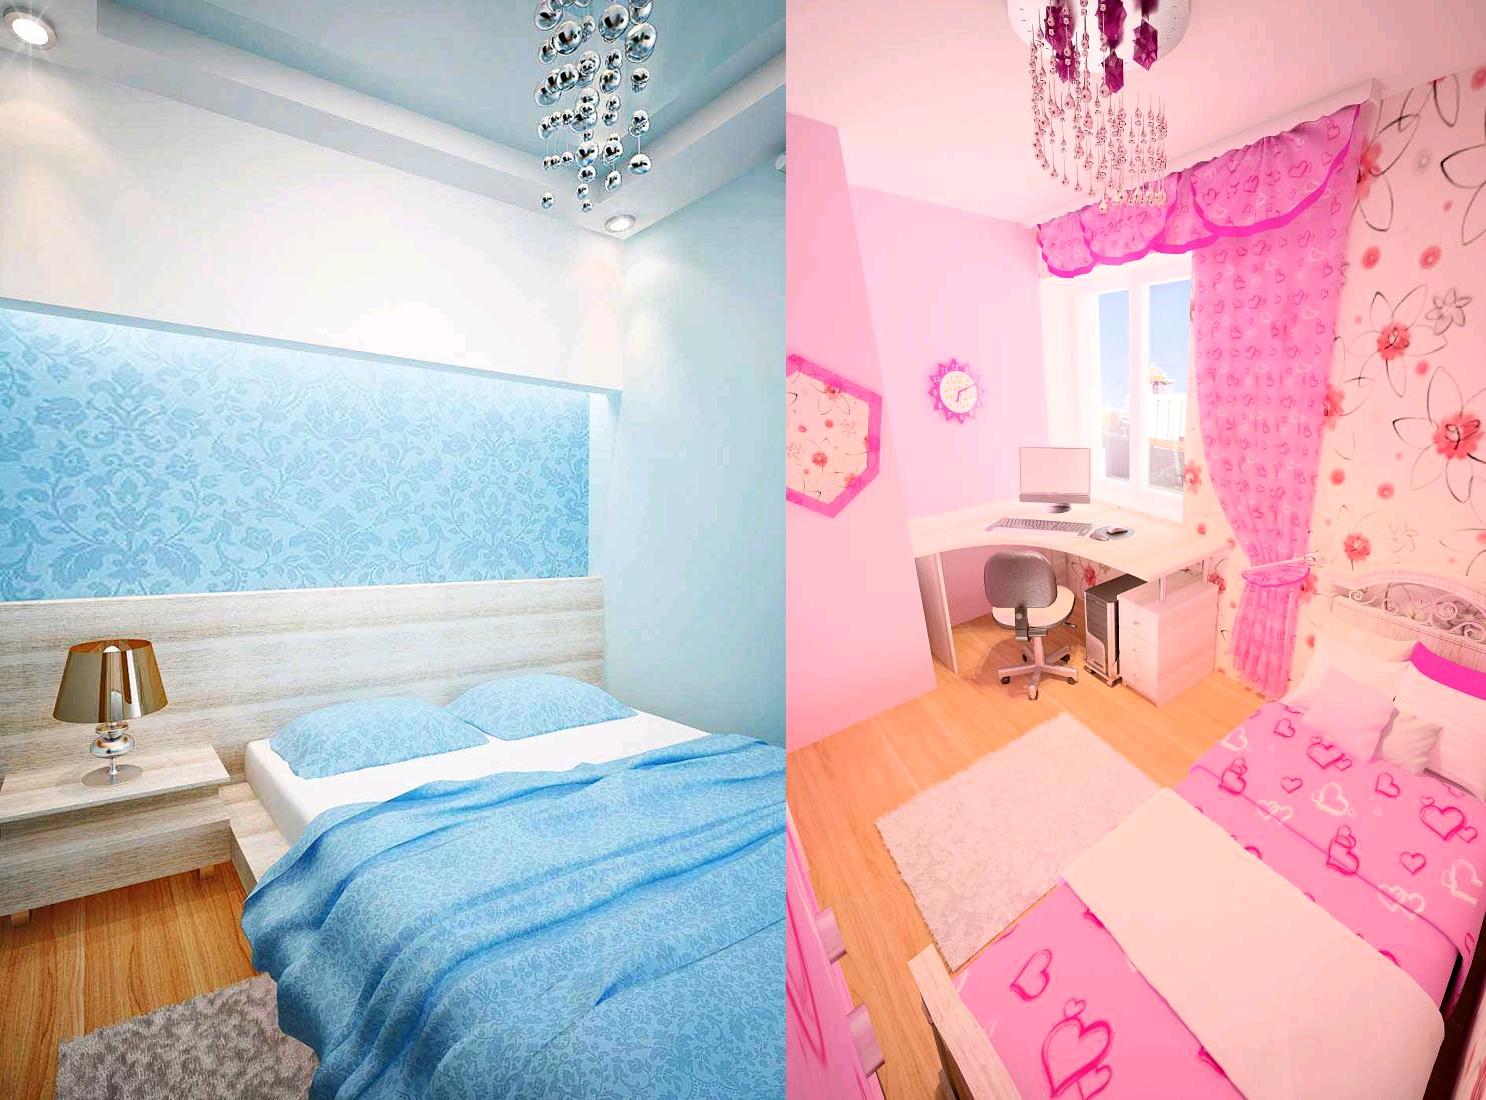 Комната в однокомнатной квартире для родителей и ребенка фото